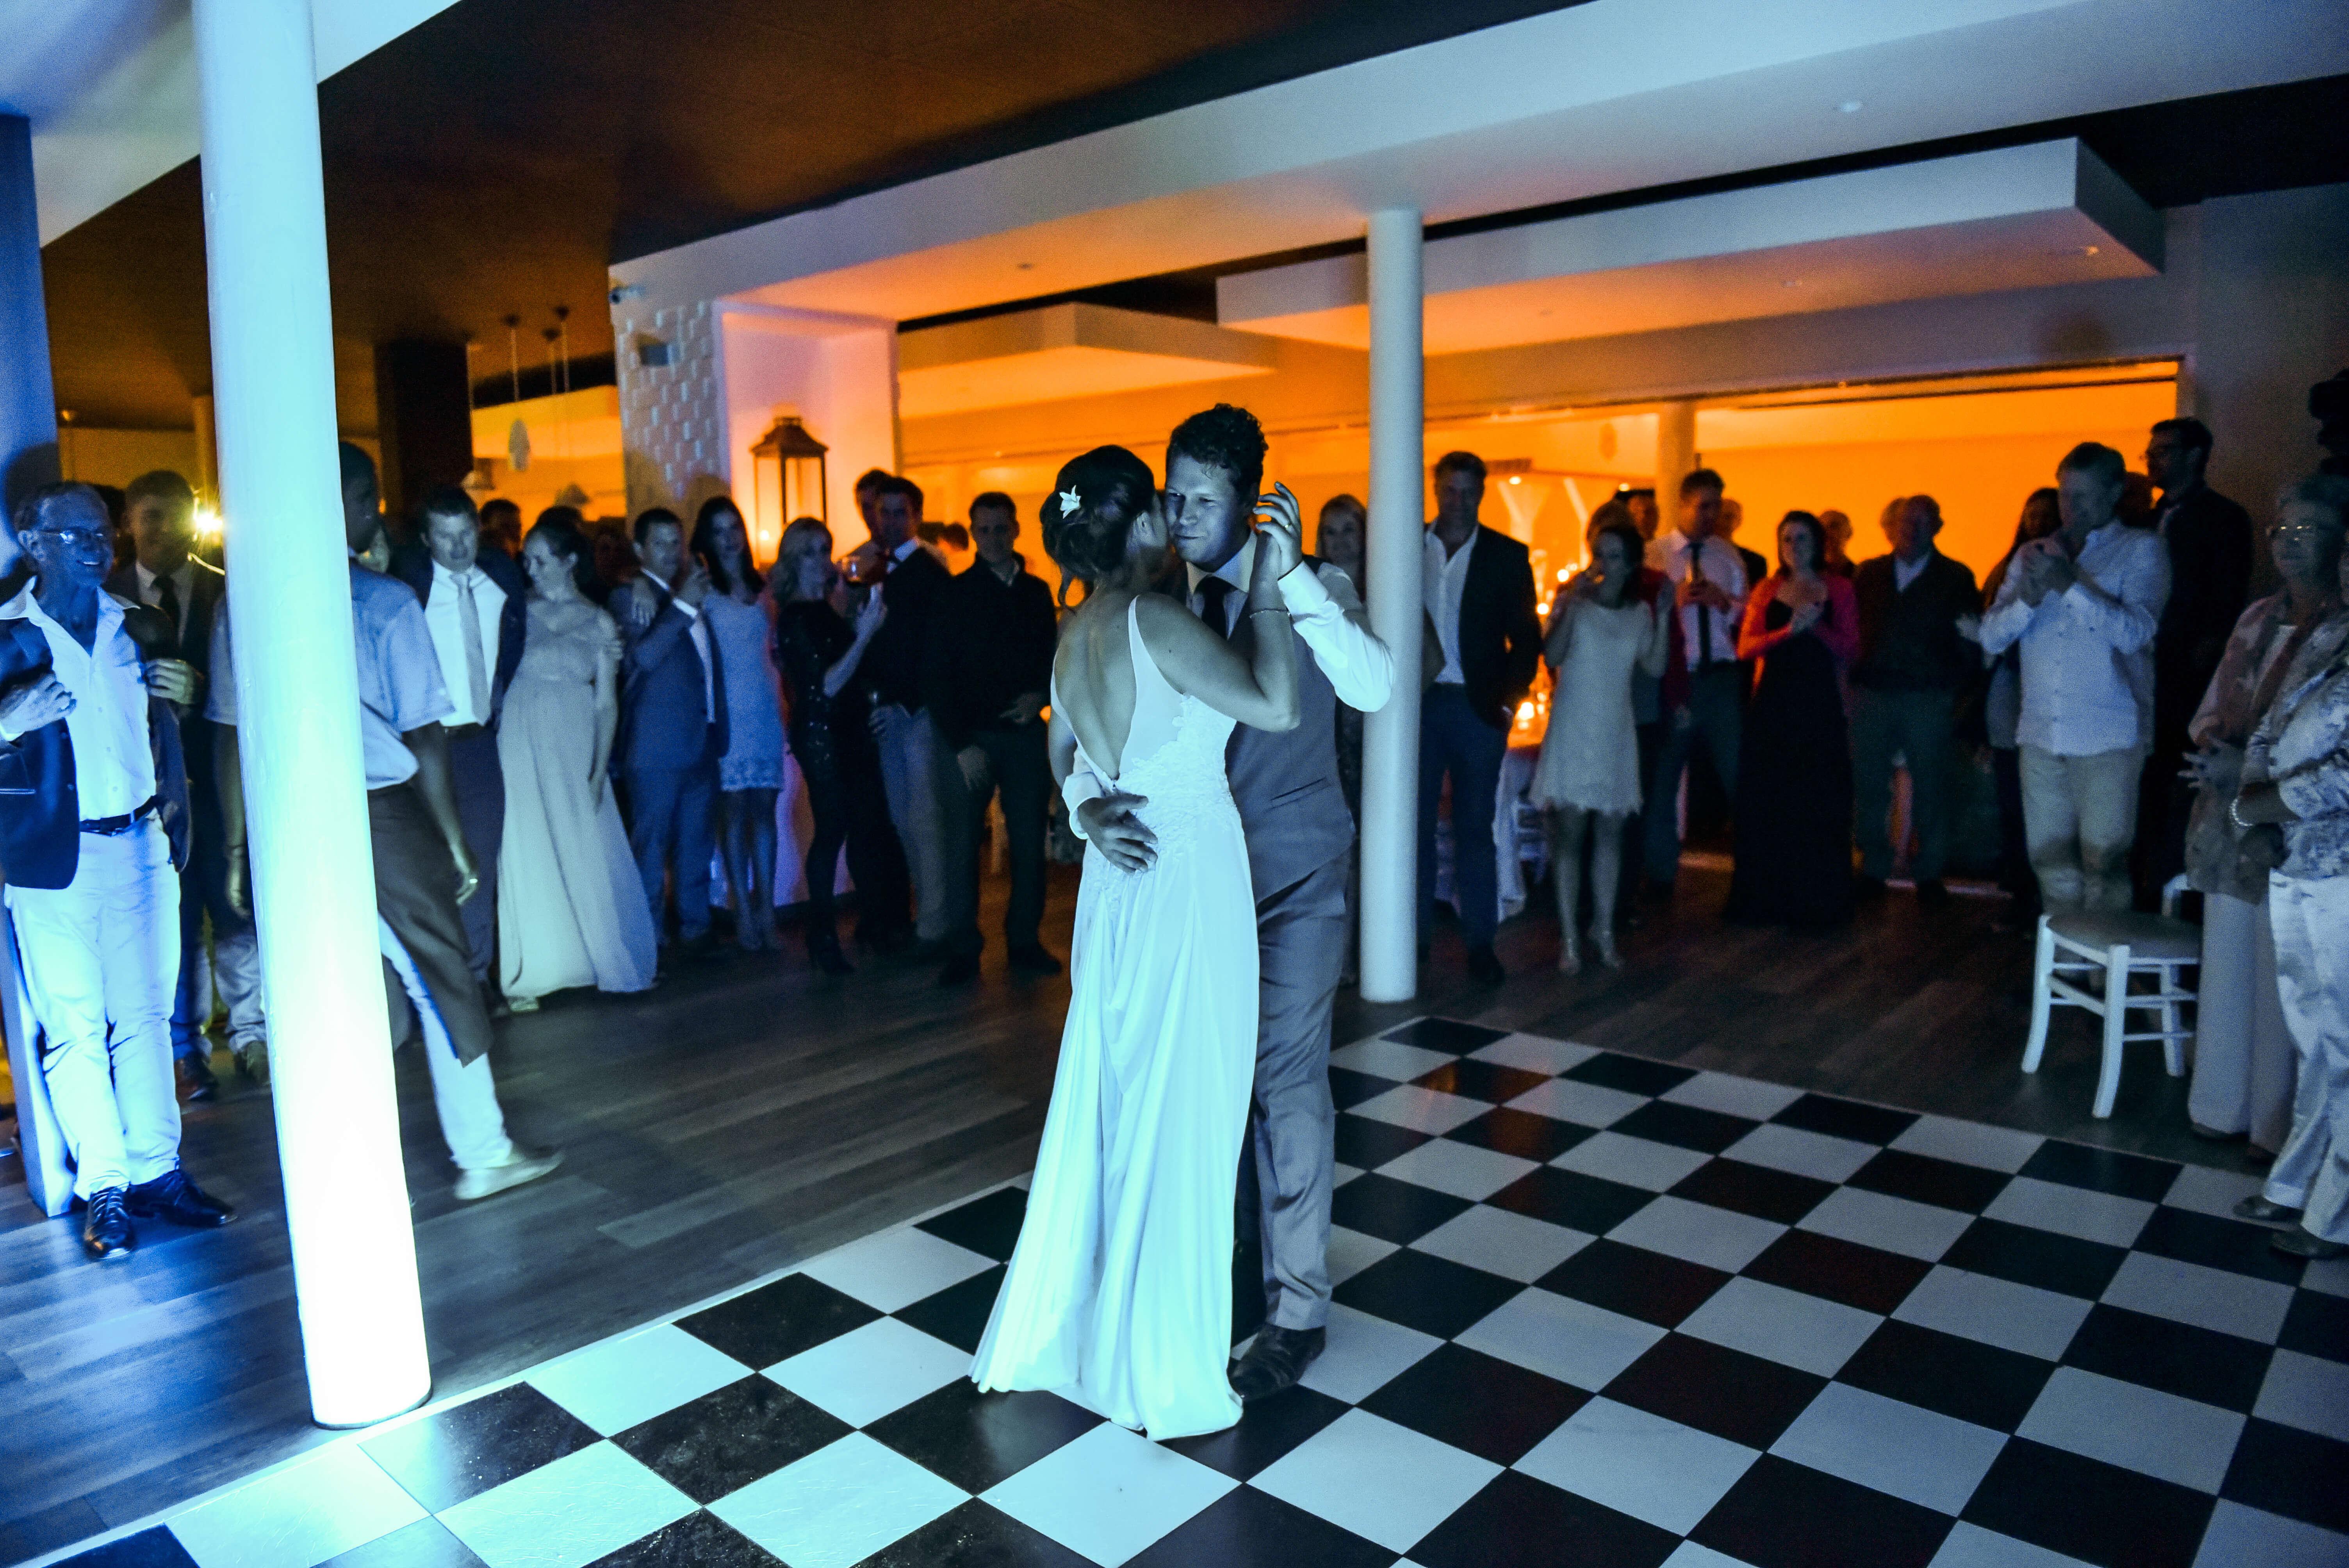 A bride and groom dancing at their Plett wedding on a blue lit dance floor.